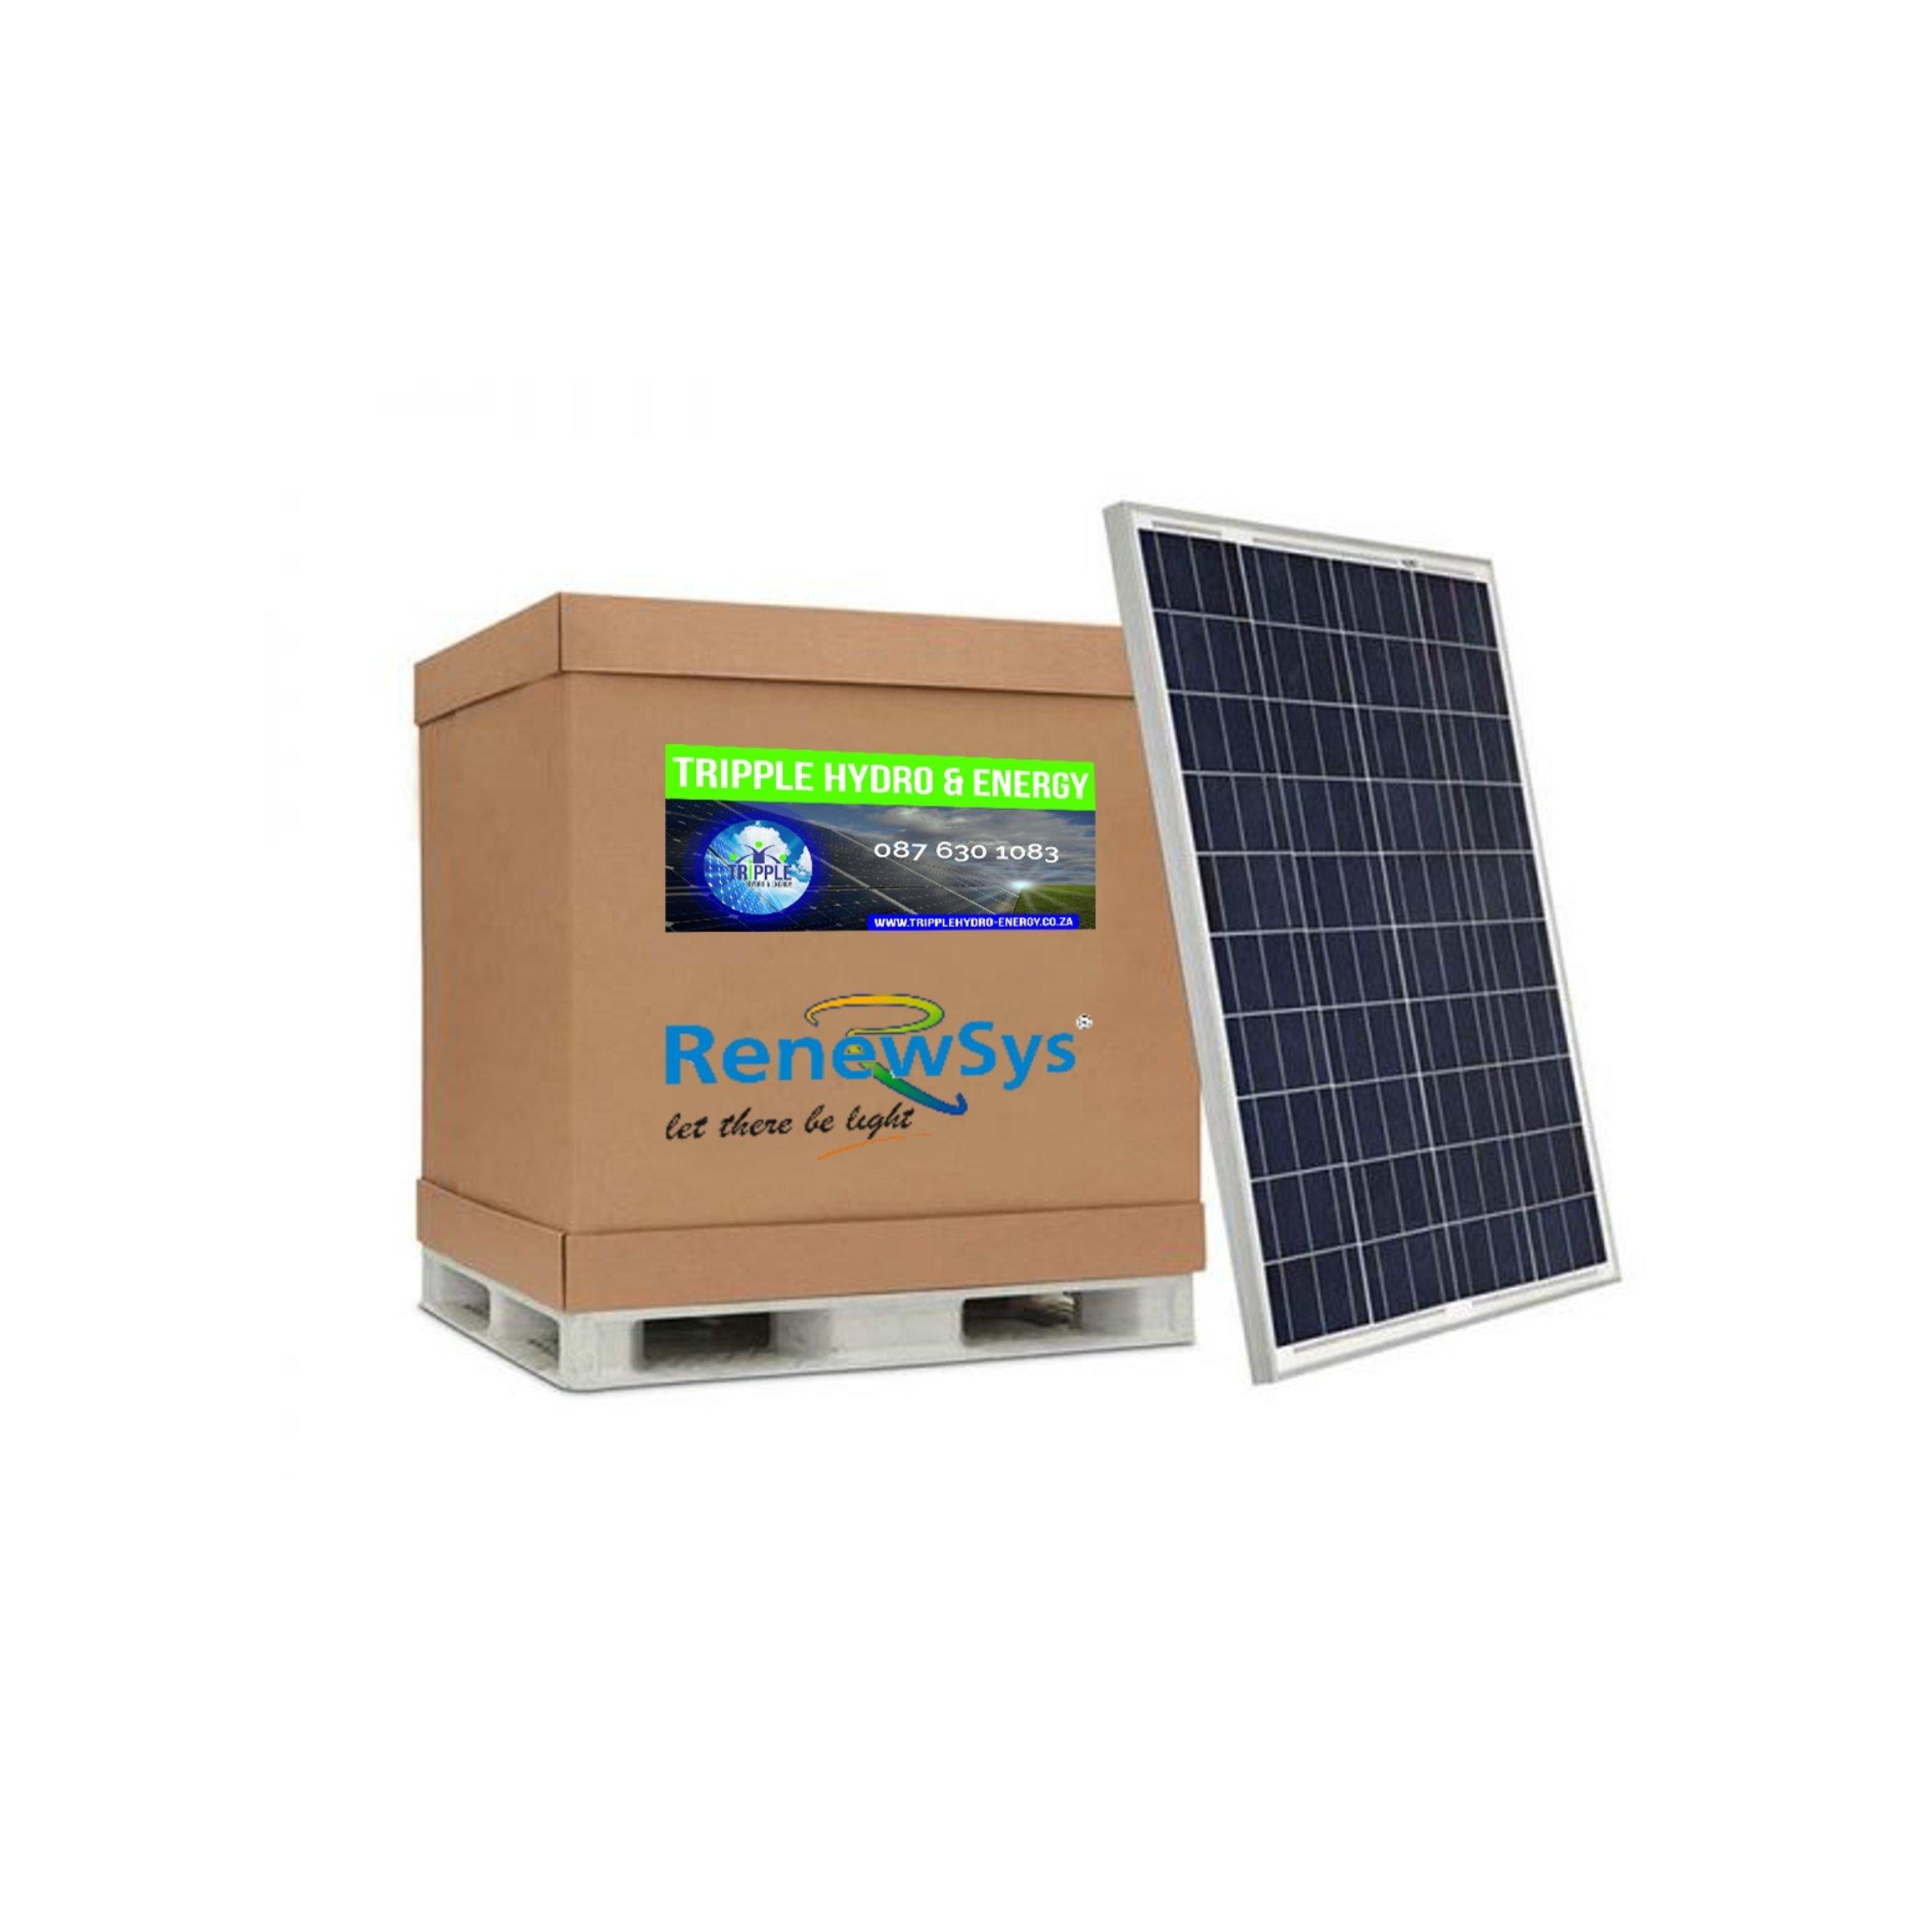 Renewsys 270 Watt Solar Panel Pallet of 26 P-REN-270W PC-26